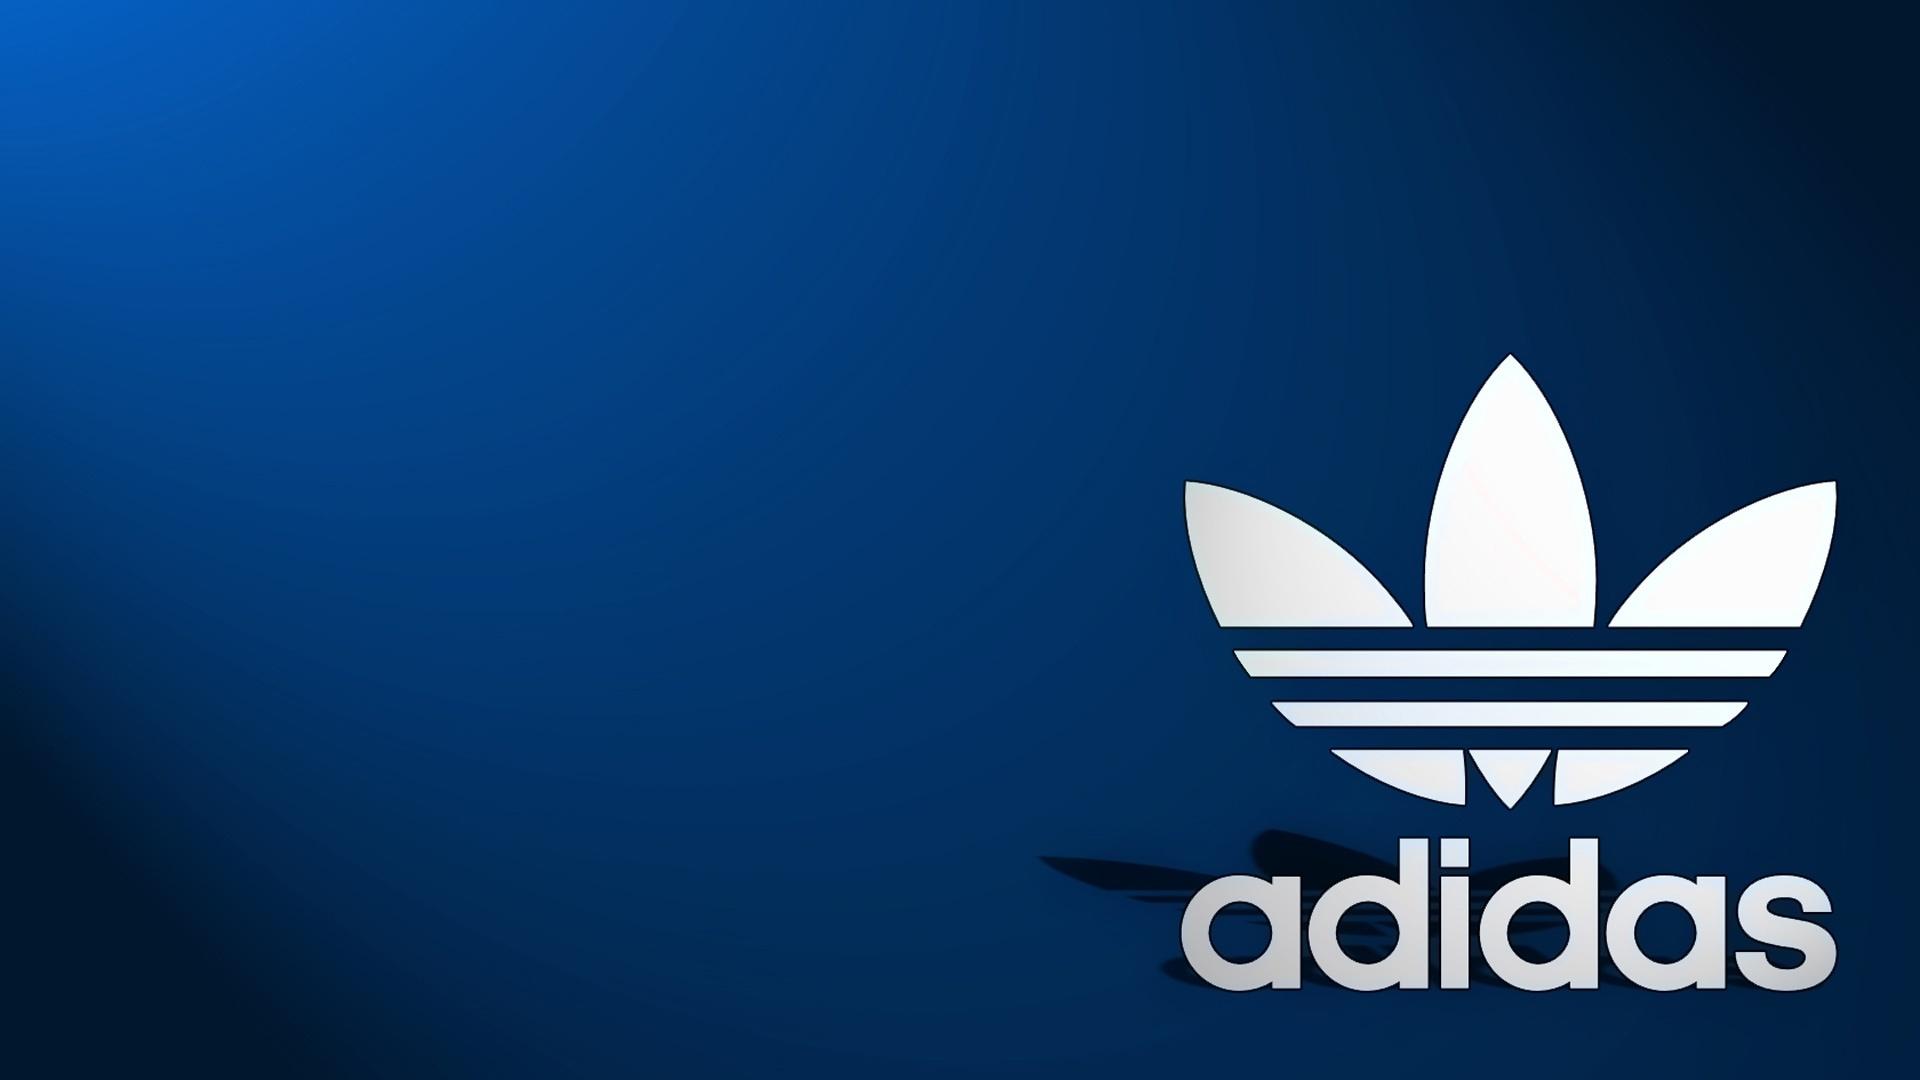 adidas wallpapers full hd